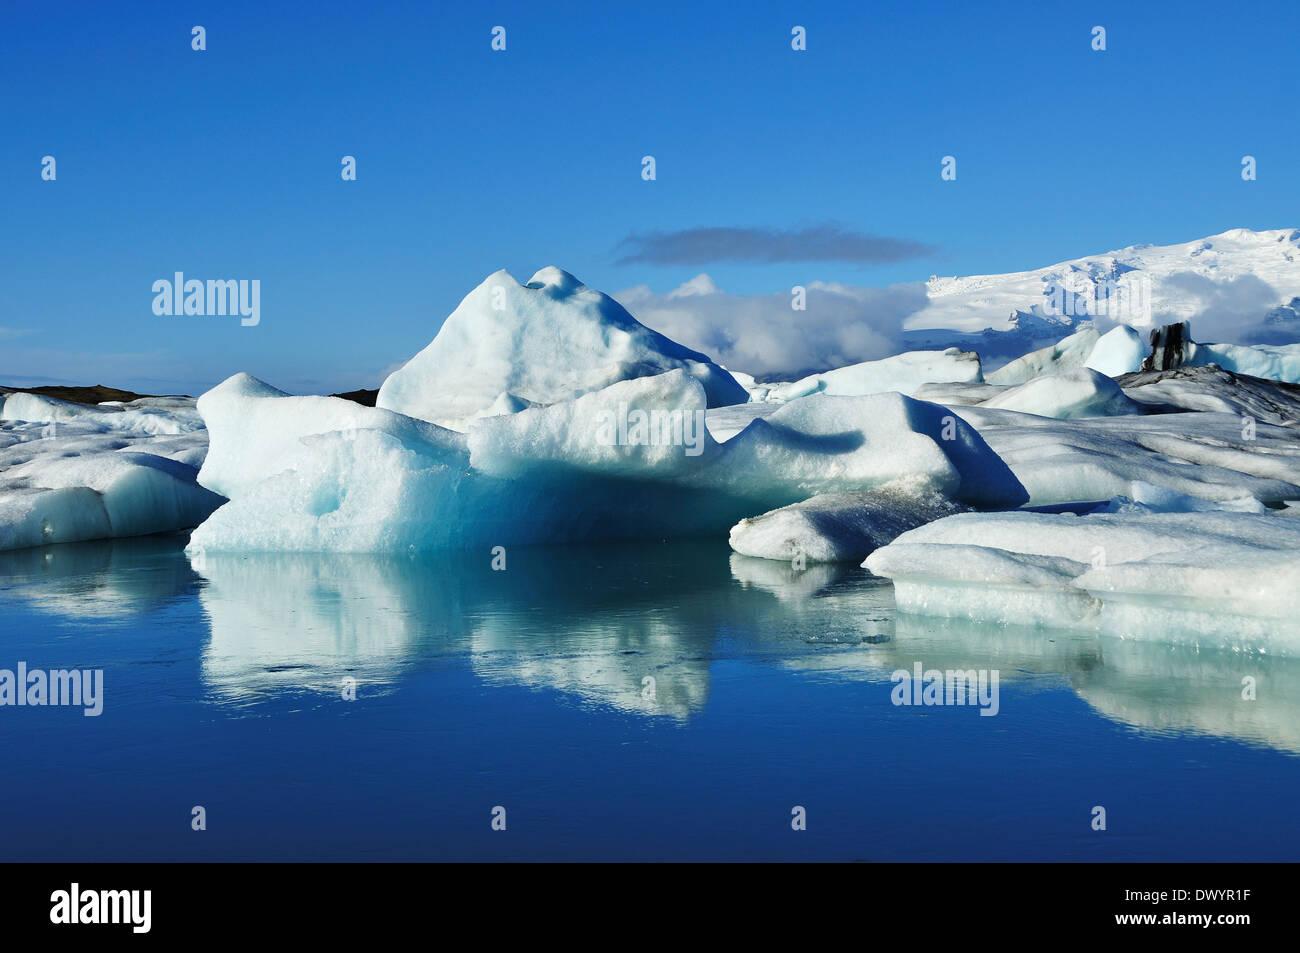 Blue icebergs floating in the jokulsarlon lagoon in Iceland - Stock Image